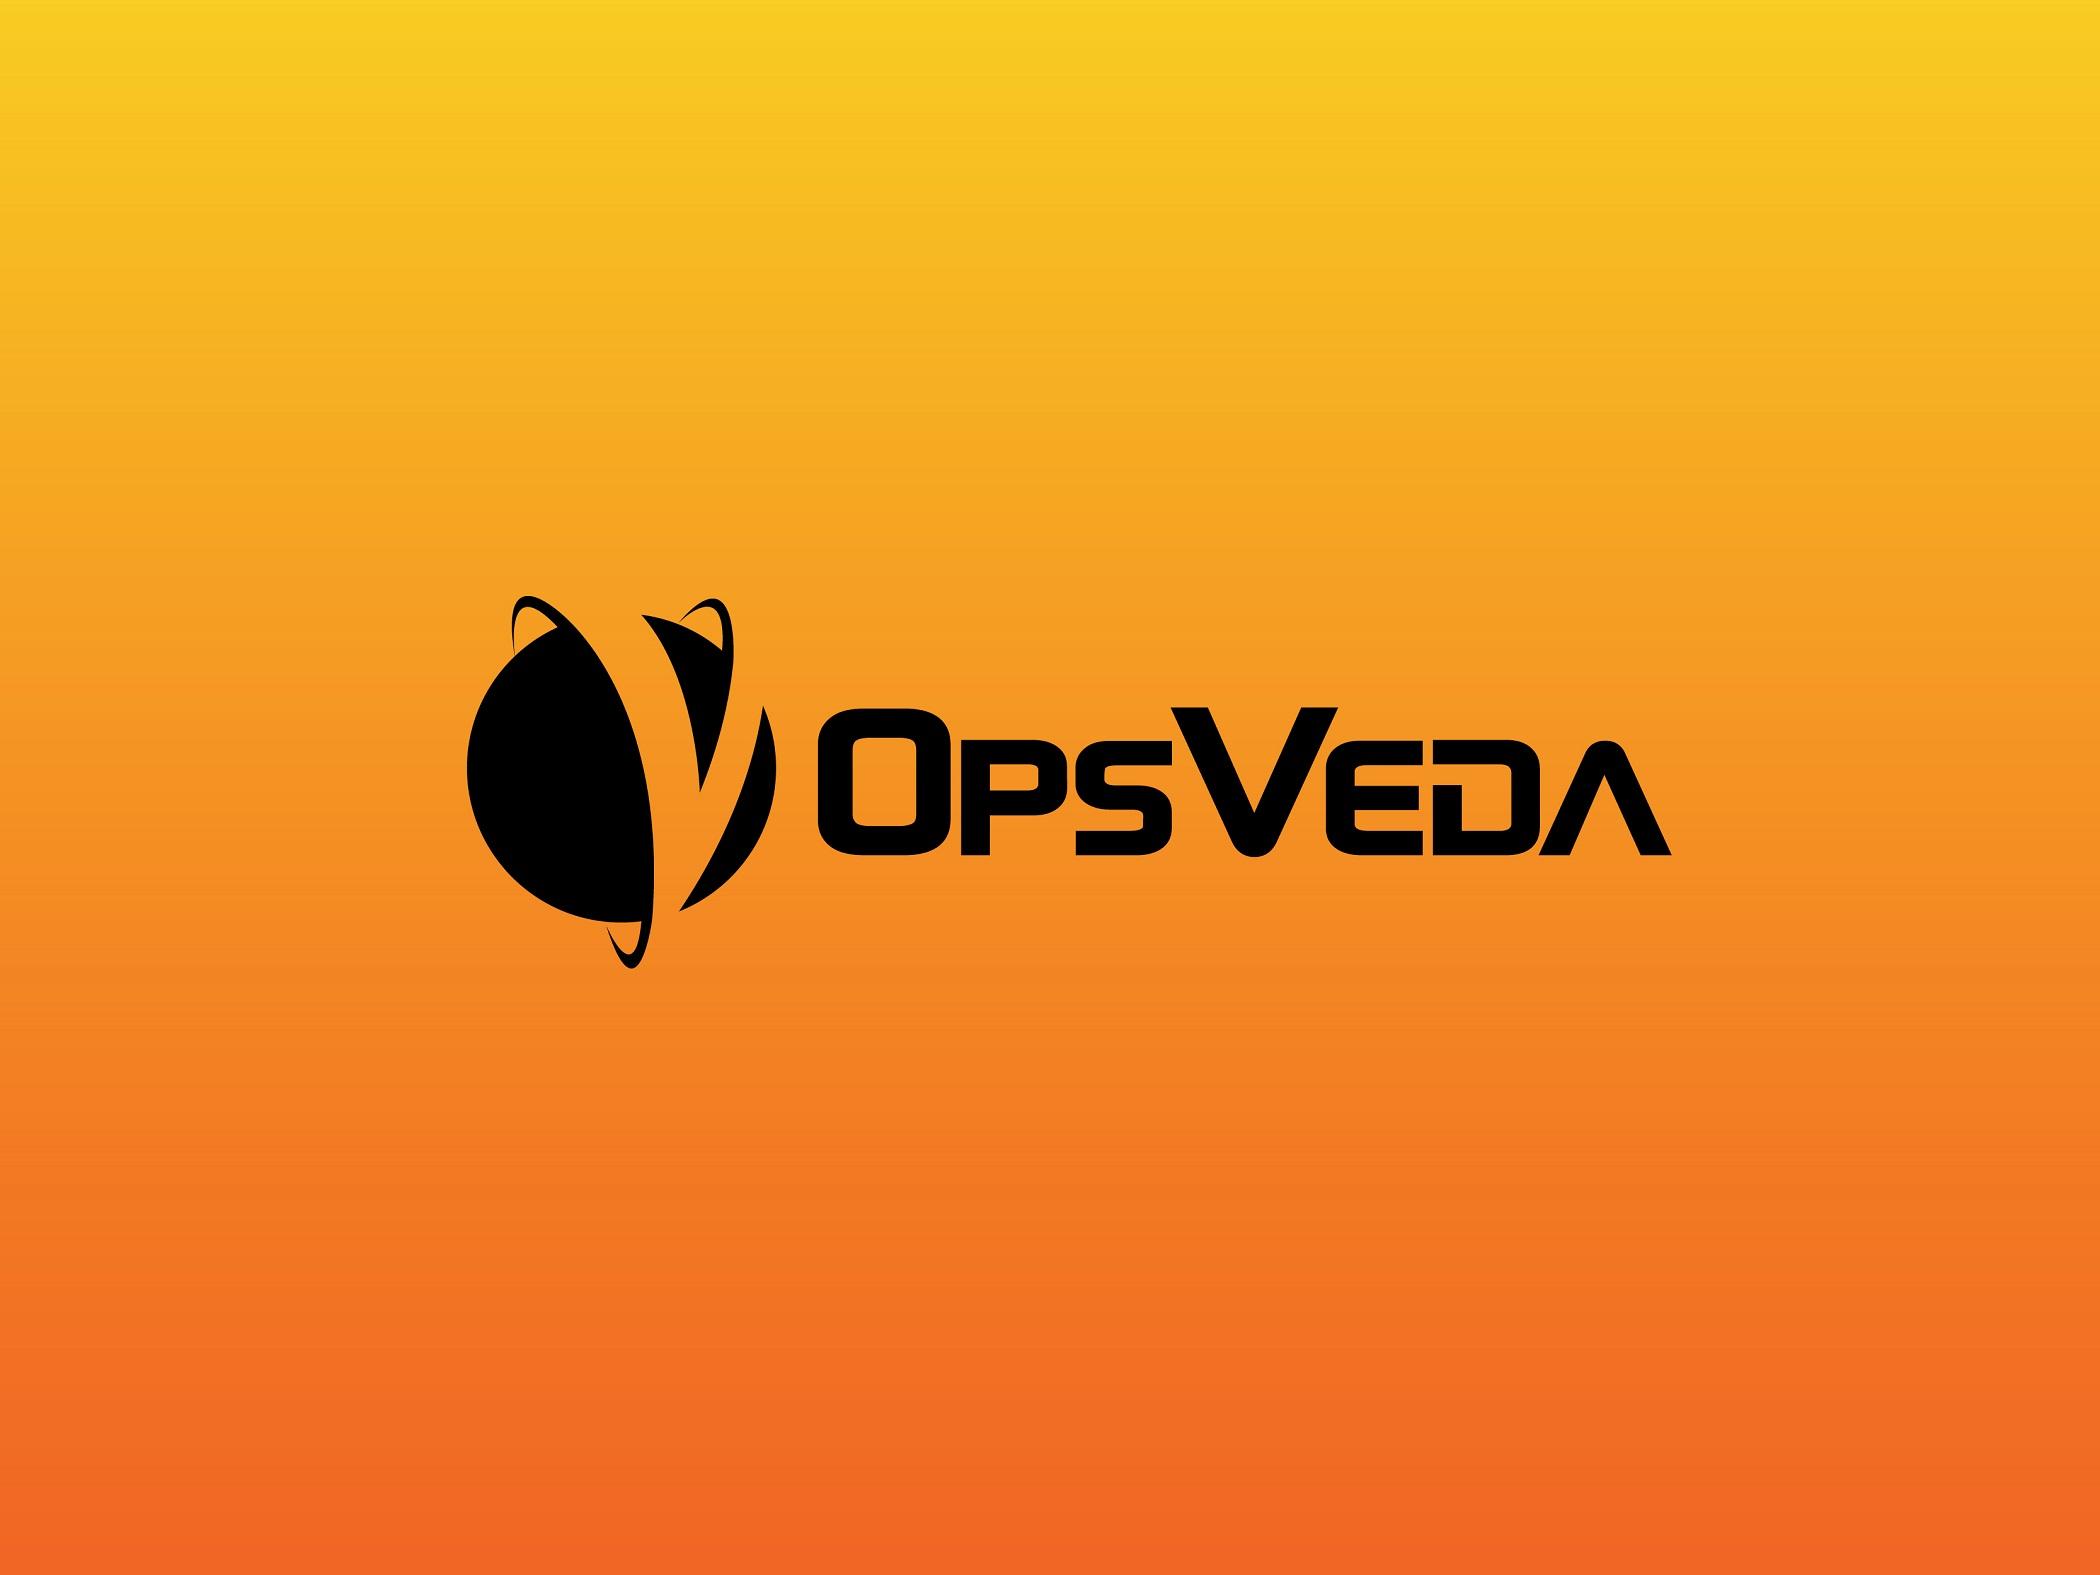 OPSVEDA orange 2100